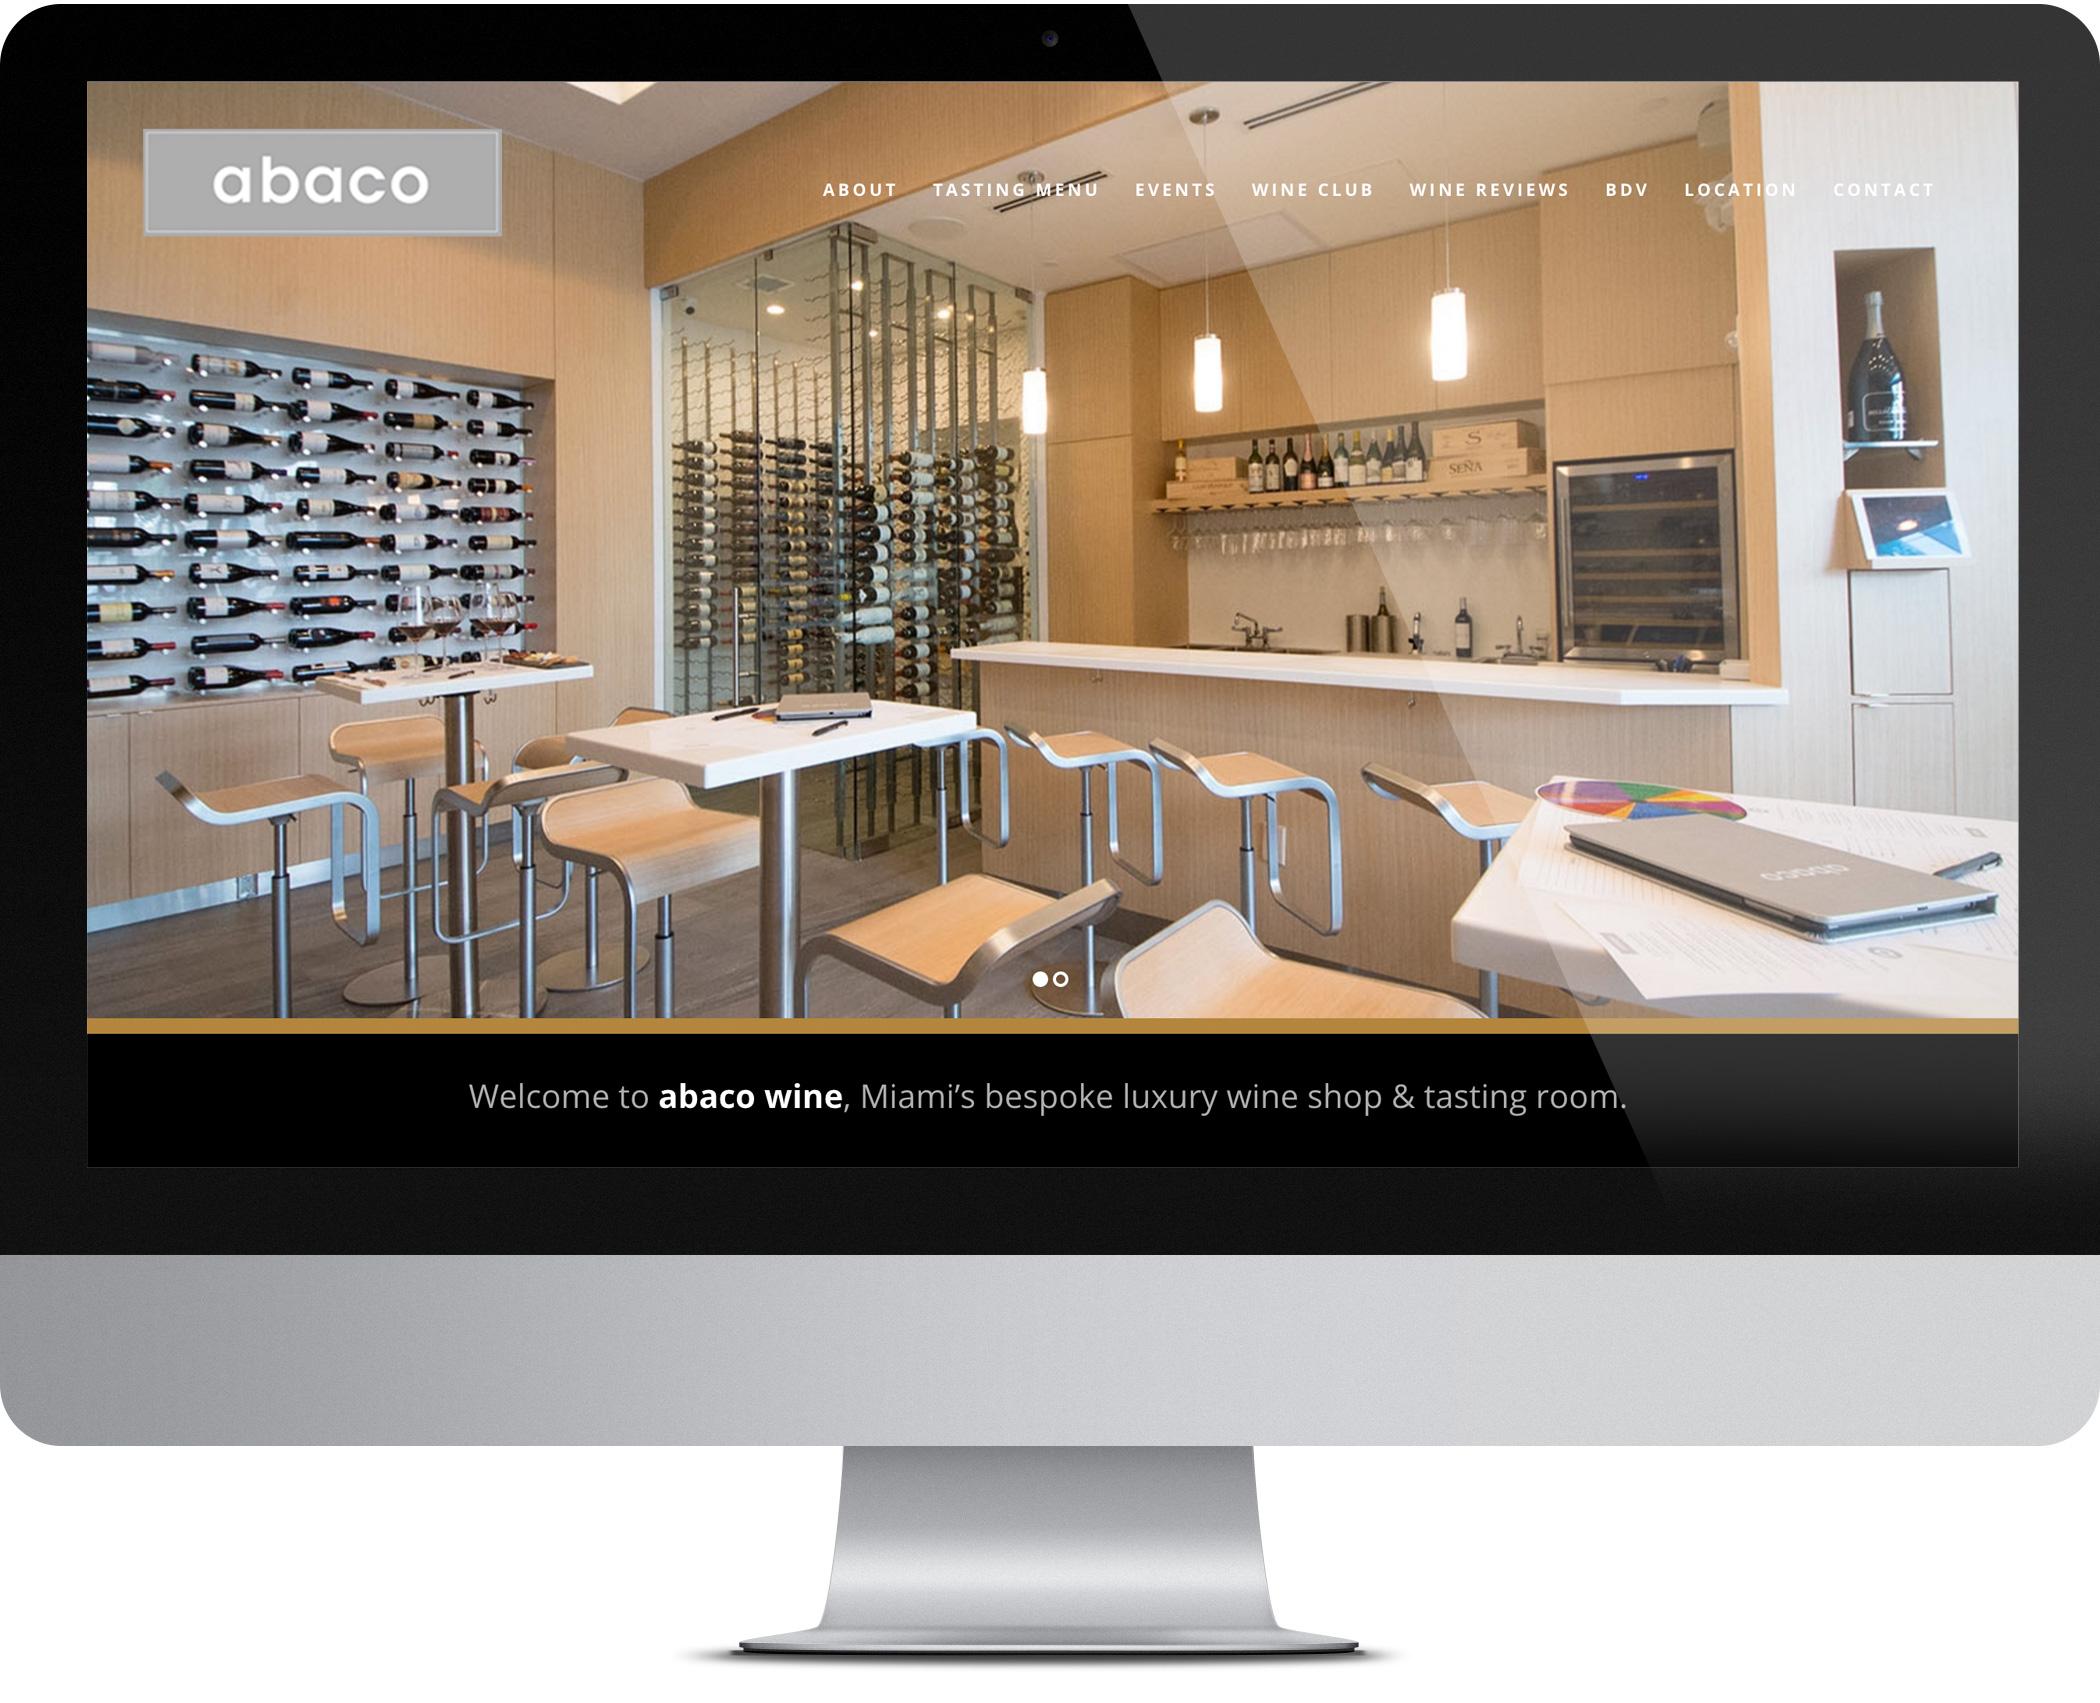 ABACO-website-desktop2.jpg